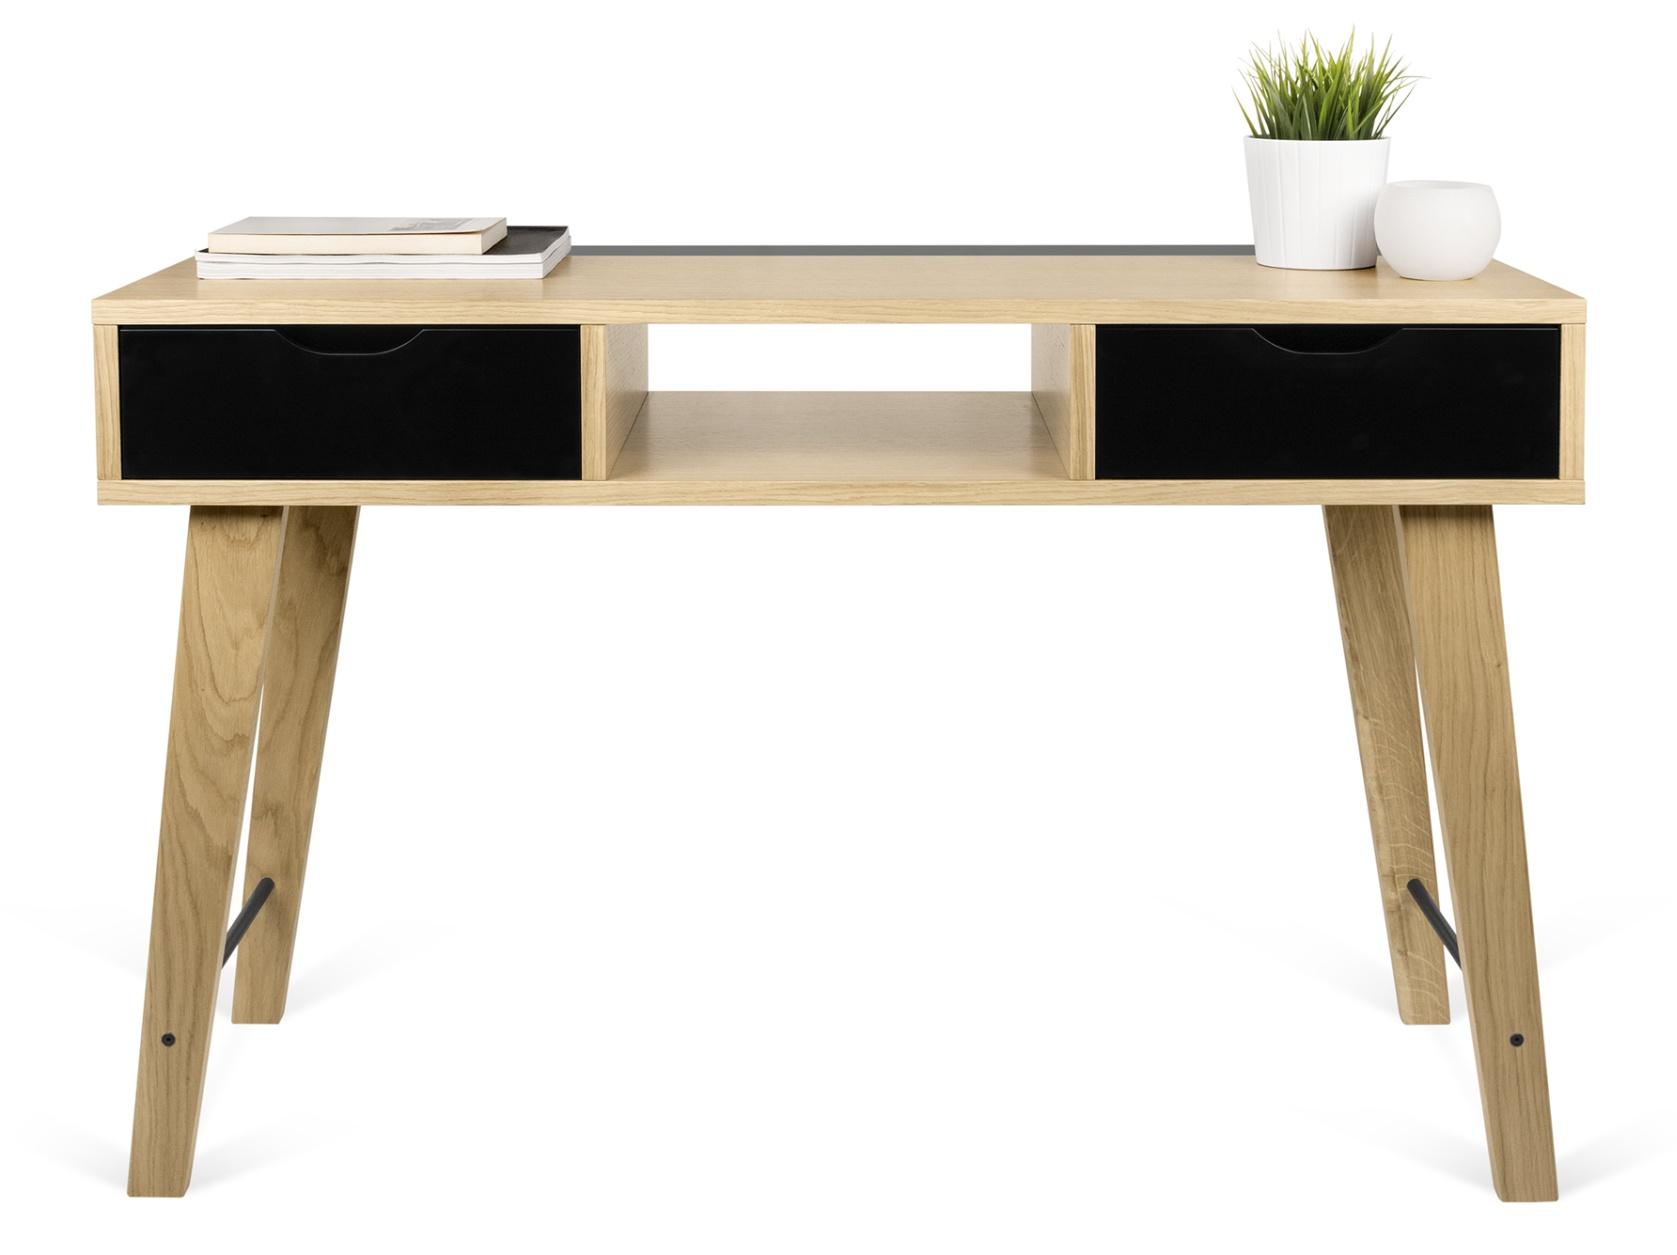 Vtwonen sidetable bureau zwart met 4 lades zwart vtwonen meubelen in de aanbieding kopen - Houtkleur zwart ...